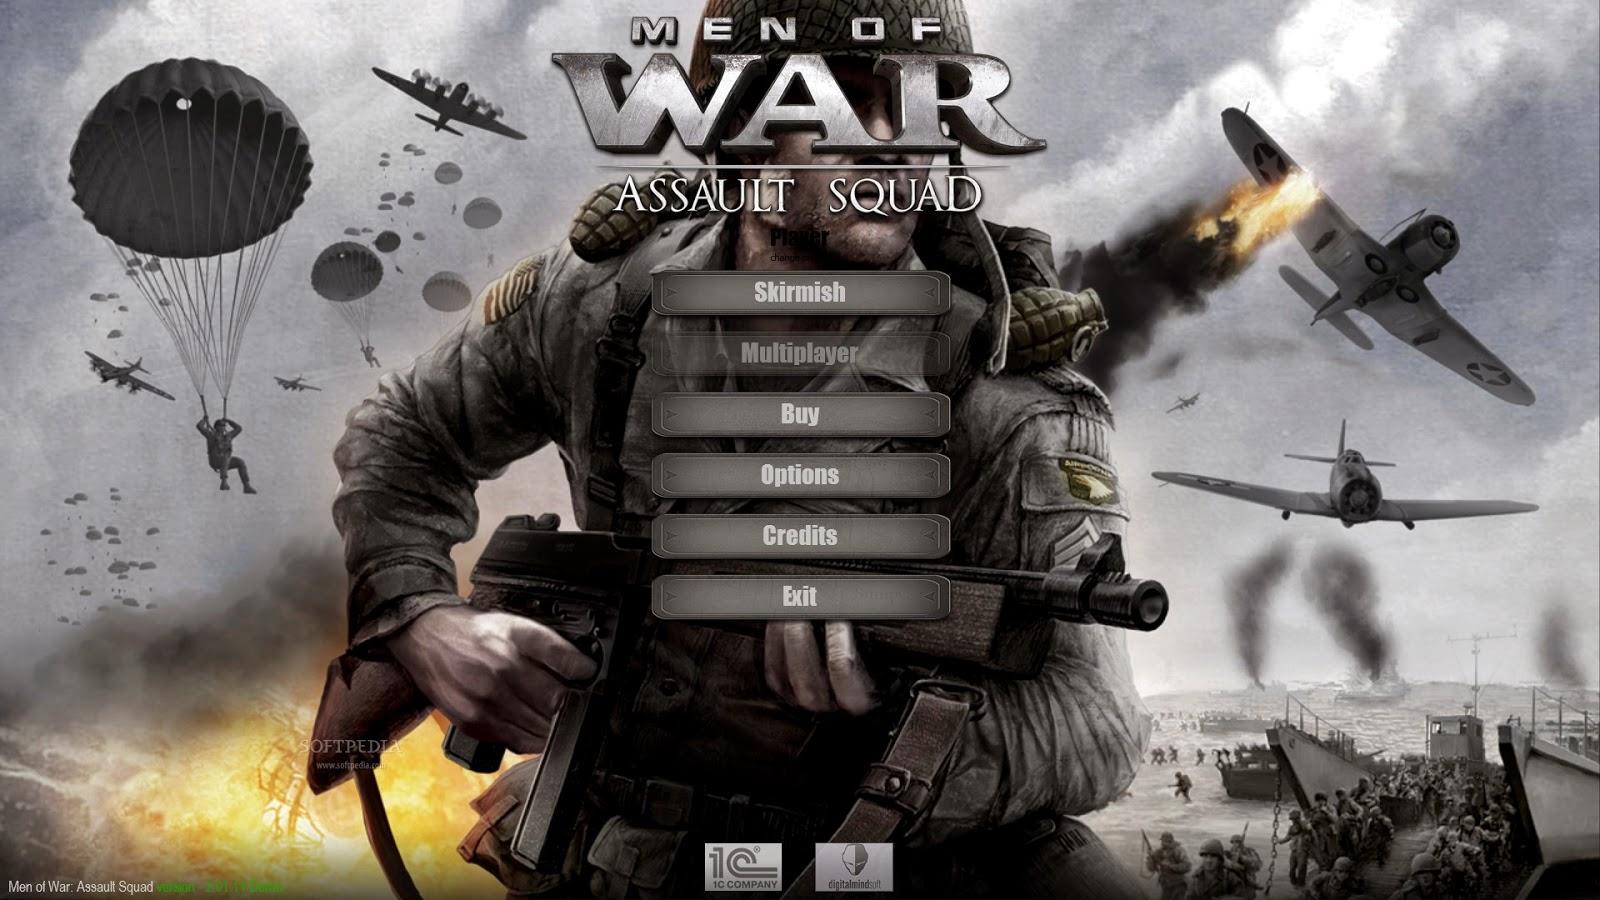 Men Of War Assault Squad 2 Free Download Game - DownMatrix